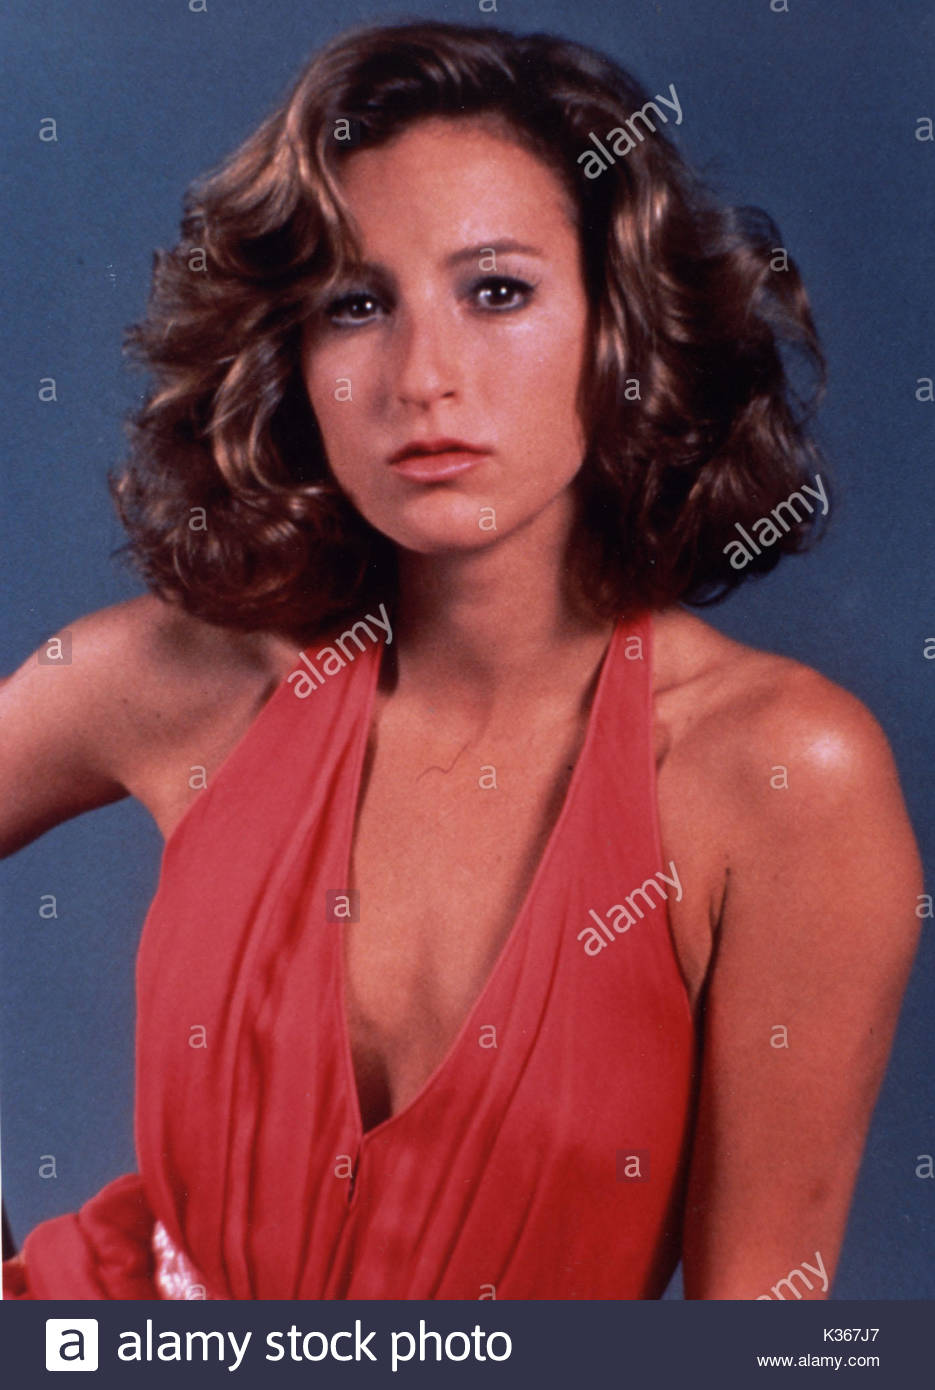 Jennifer grey dating